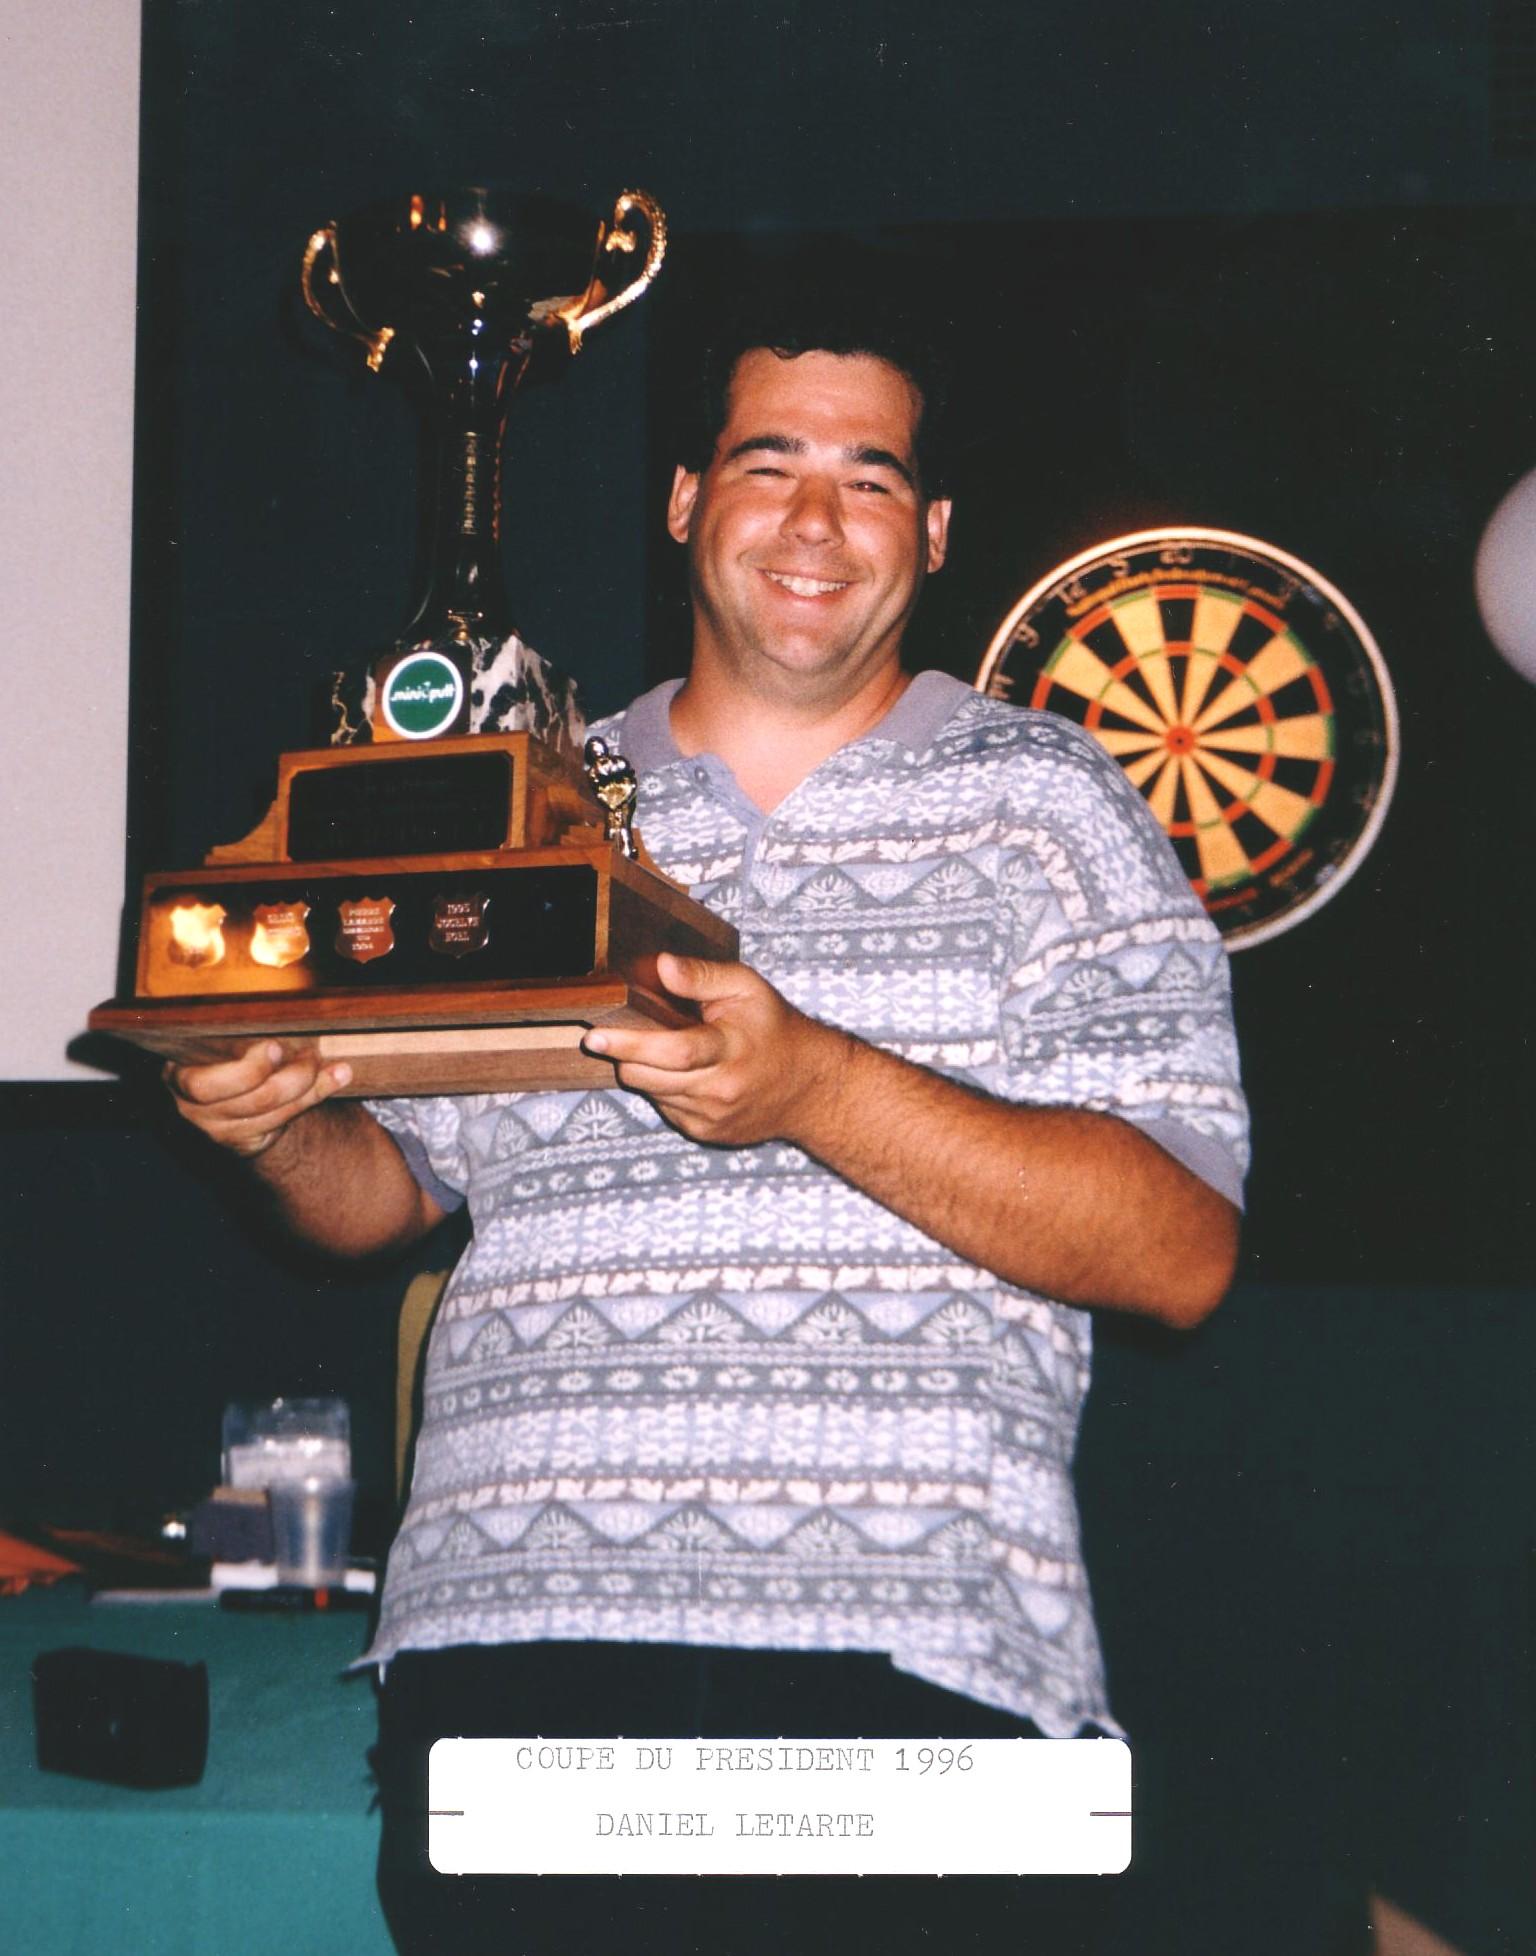 Letarte Daniel Presiden 1996